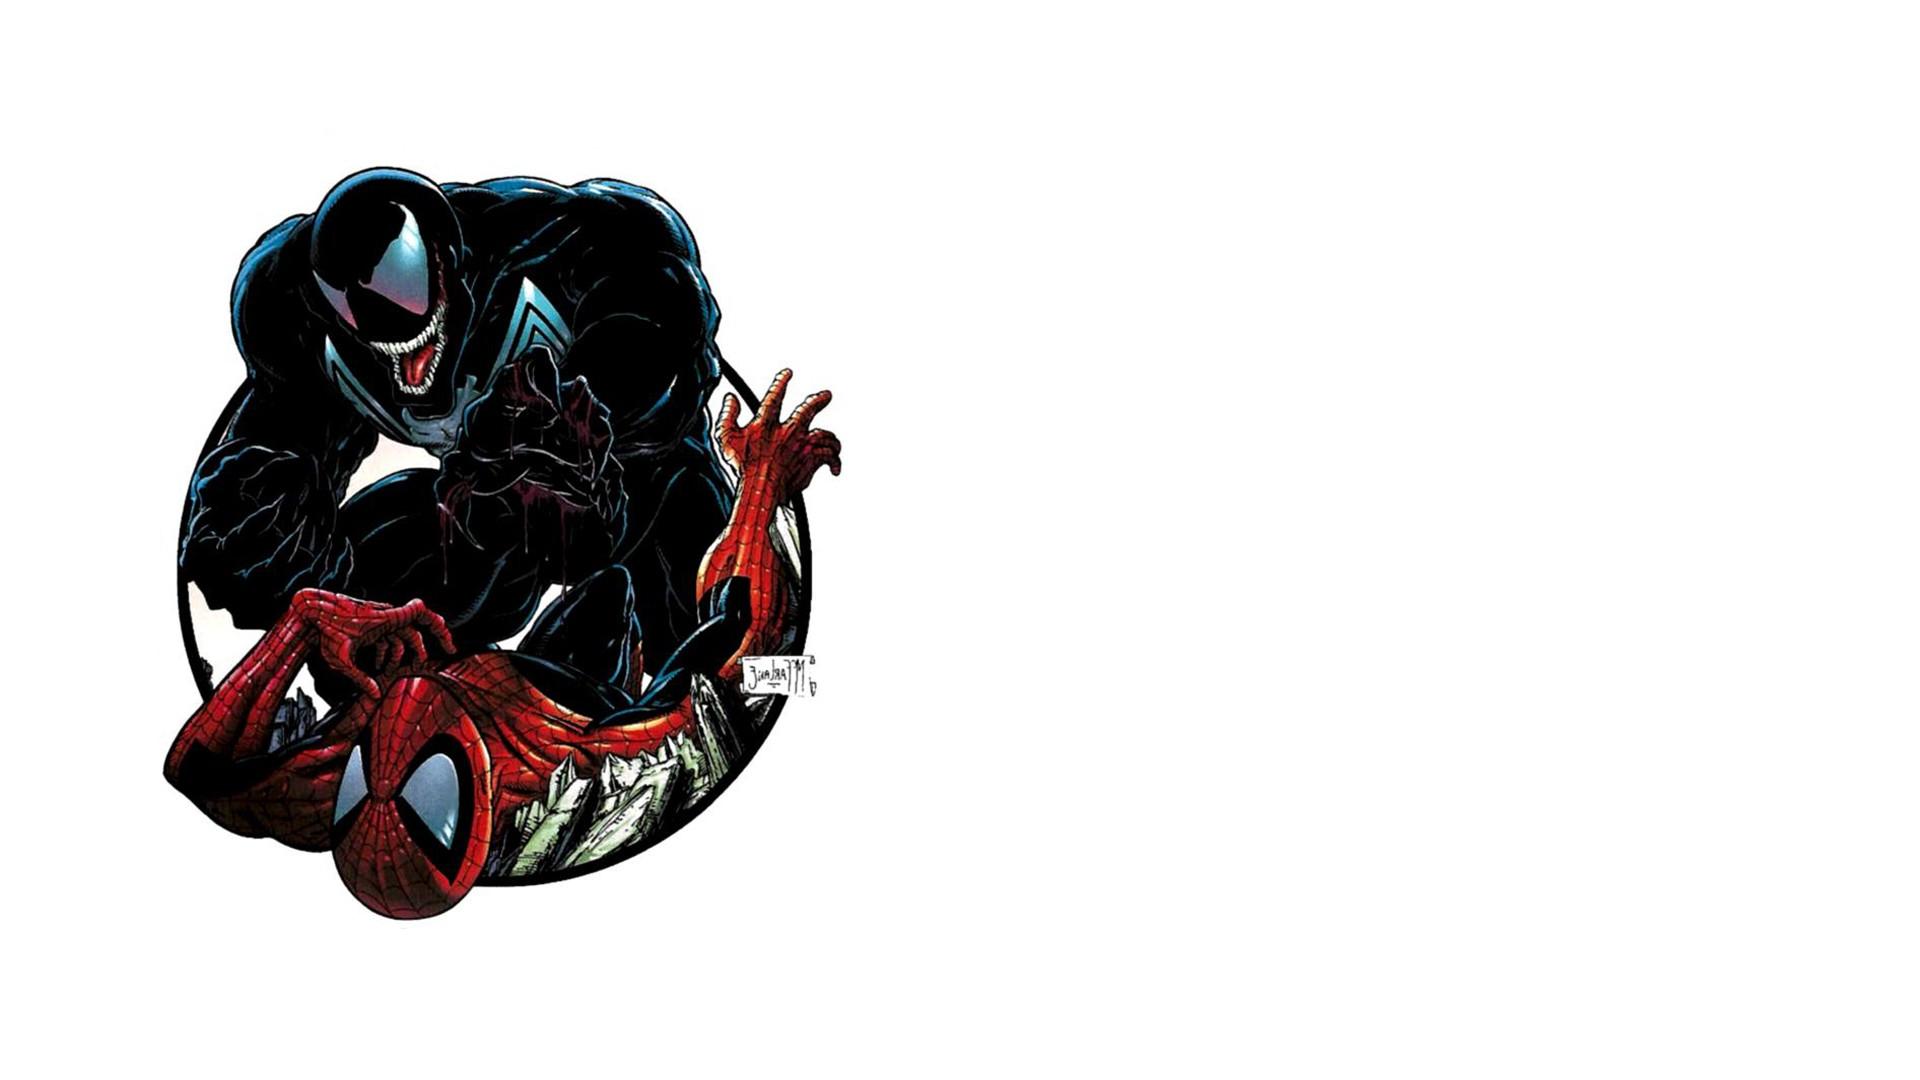 3d Wallpapers For Home Screen Comics Spider Man Venom Wallpapers Hd Desktop And